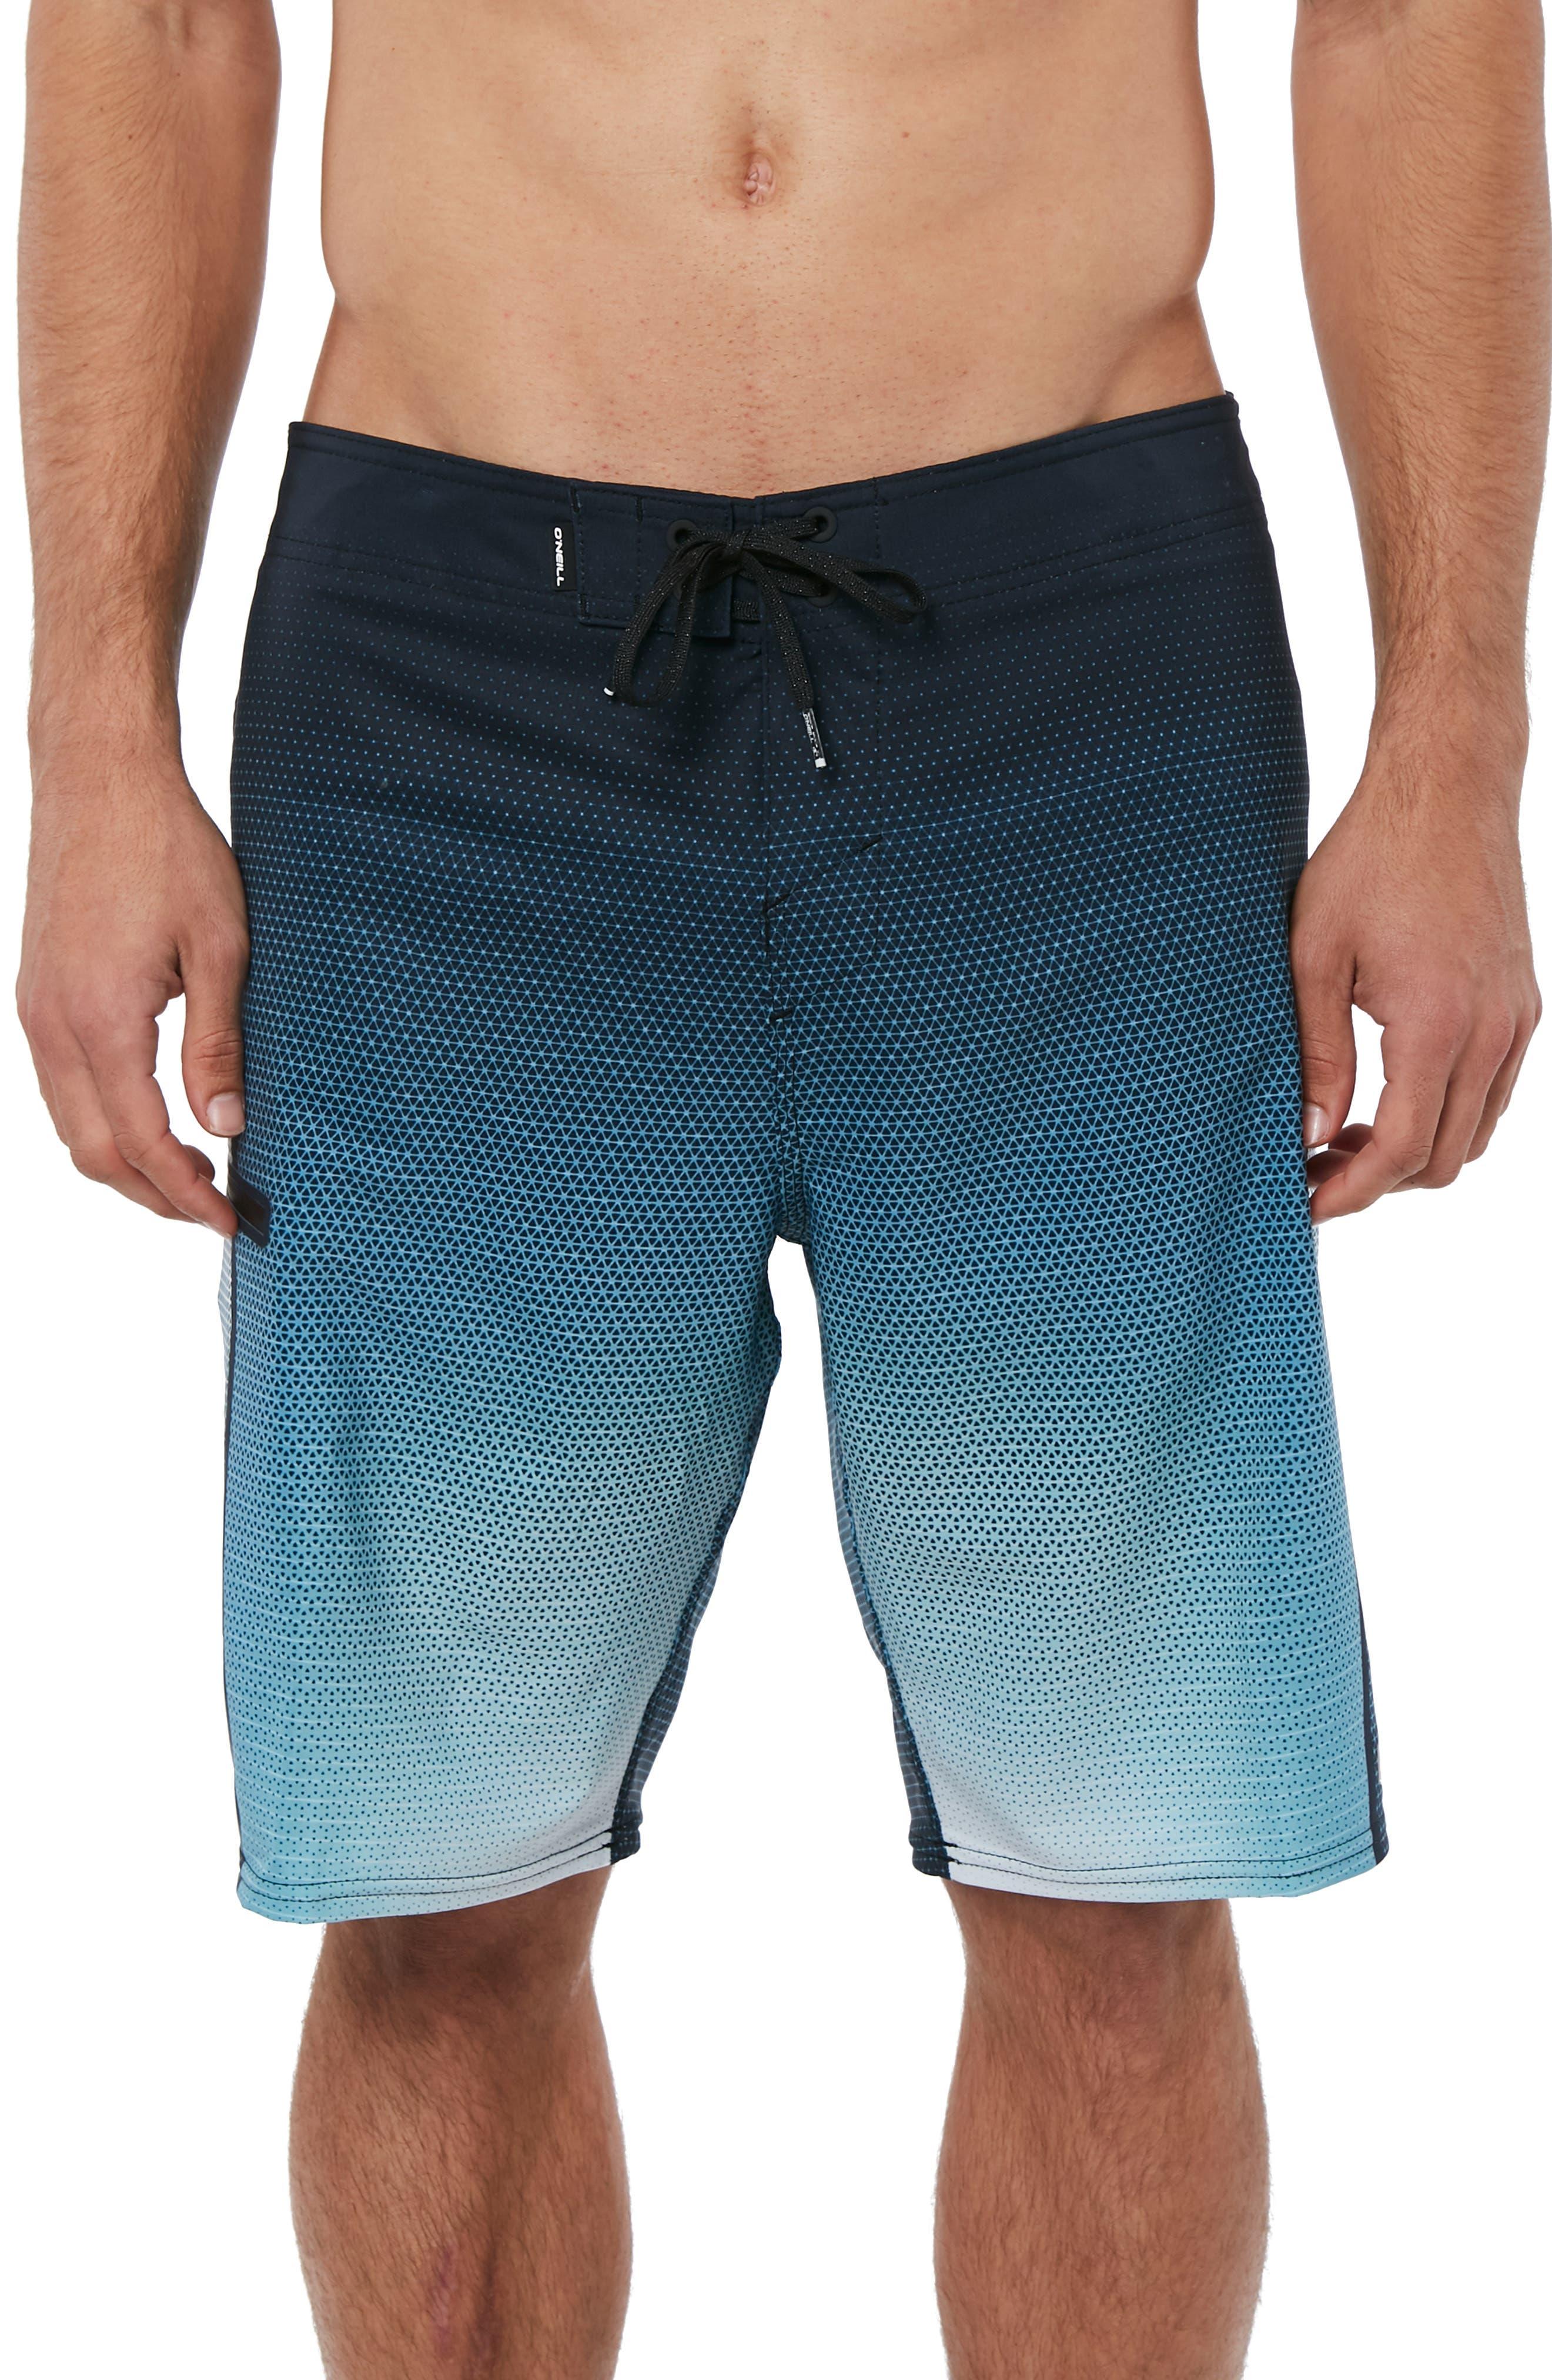 Hyperfreak Prizma Board Shorts,                         Main,                         color, TEAL